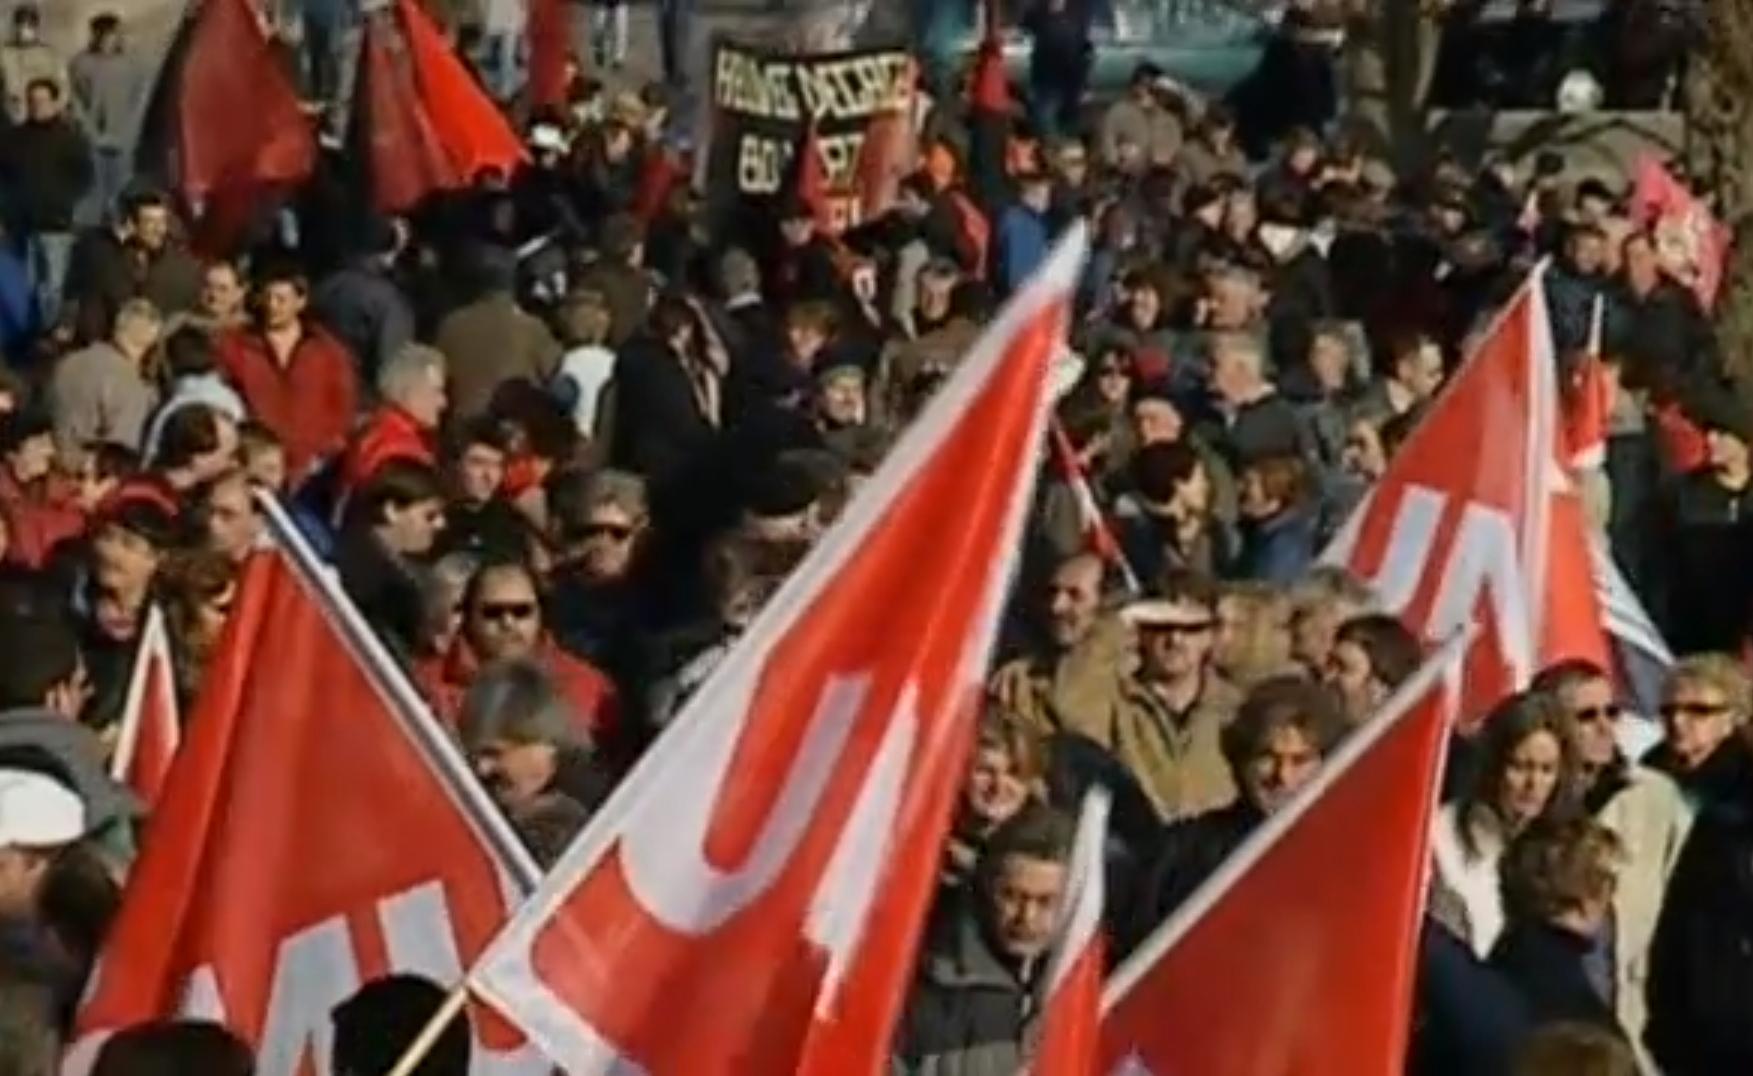 Preview image for LOM object Politik und Gesellschaft: Streiken